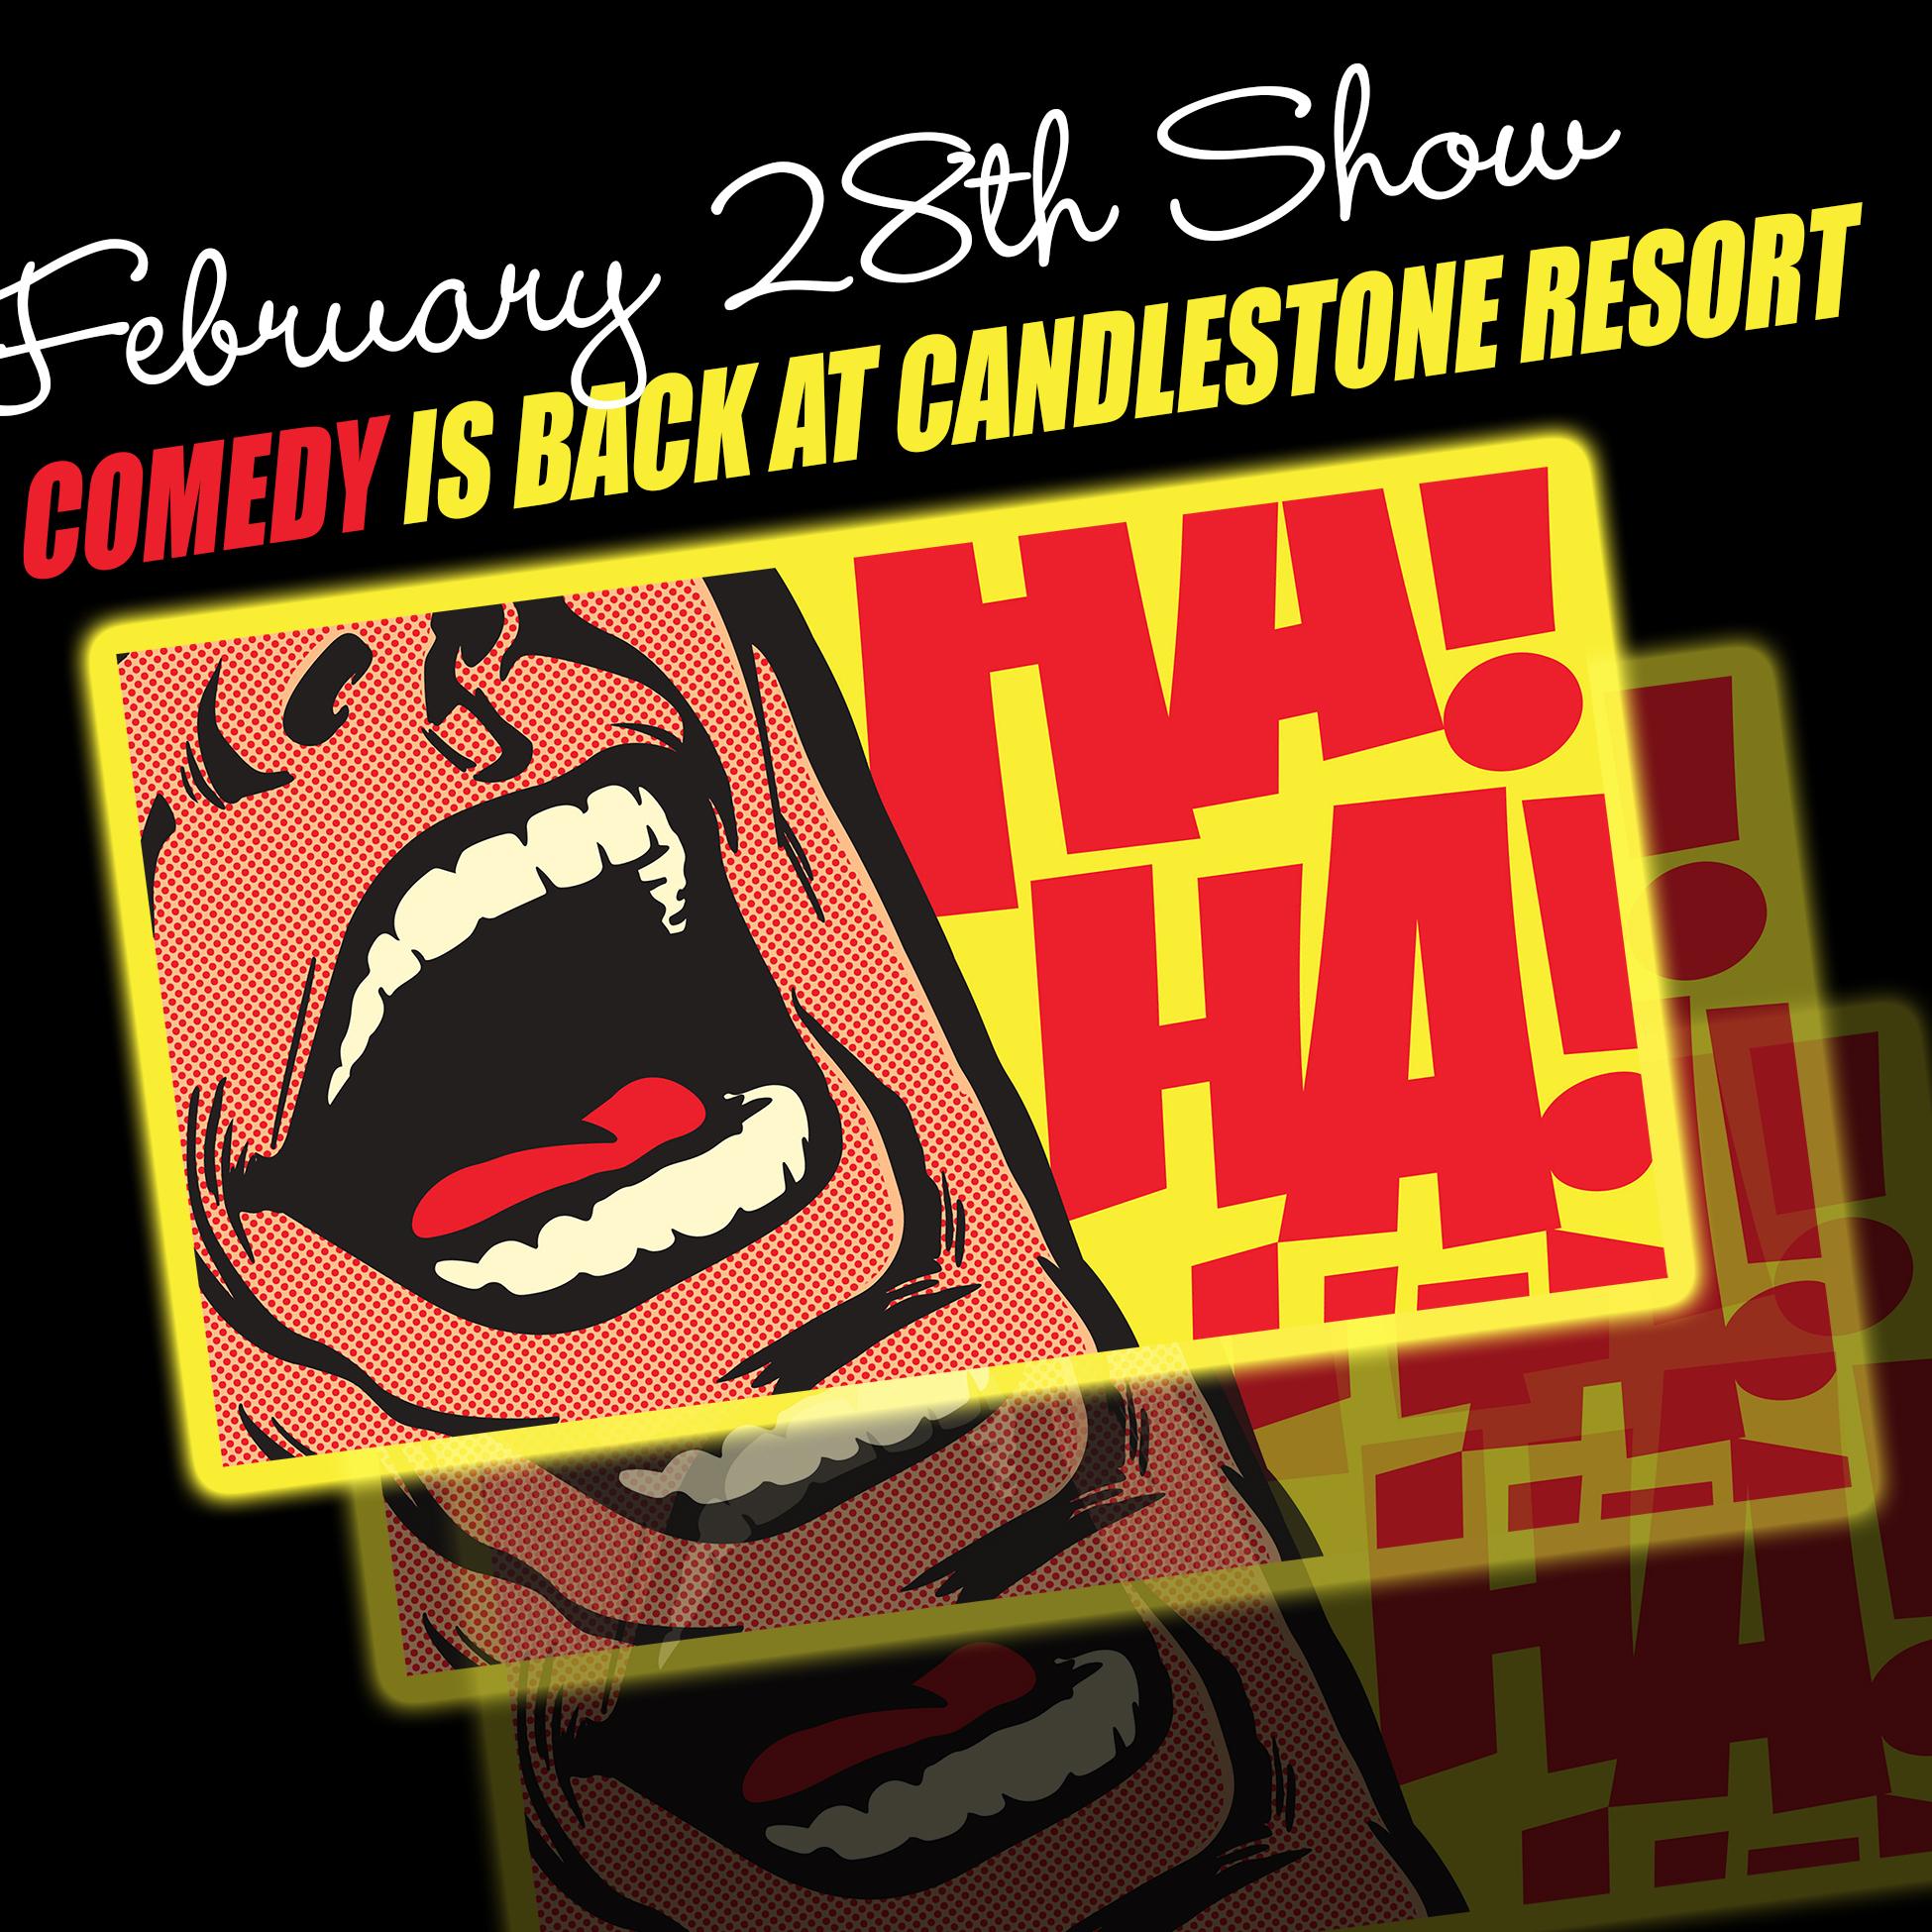 February 28th Comedy Show 2020-Comedy-Feb28th